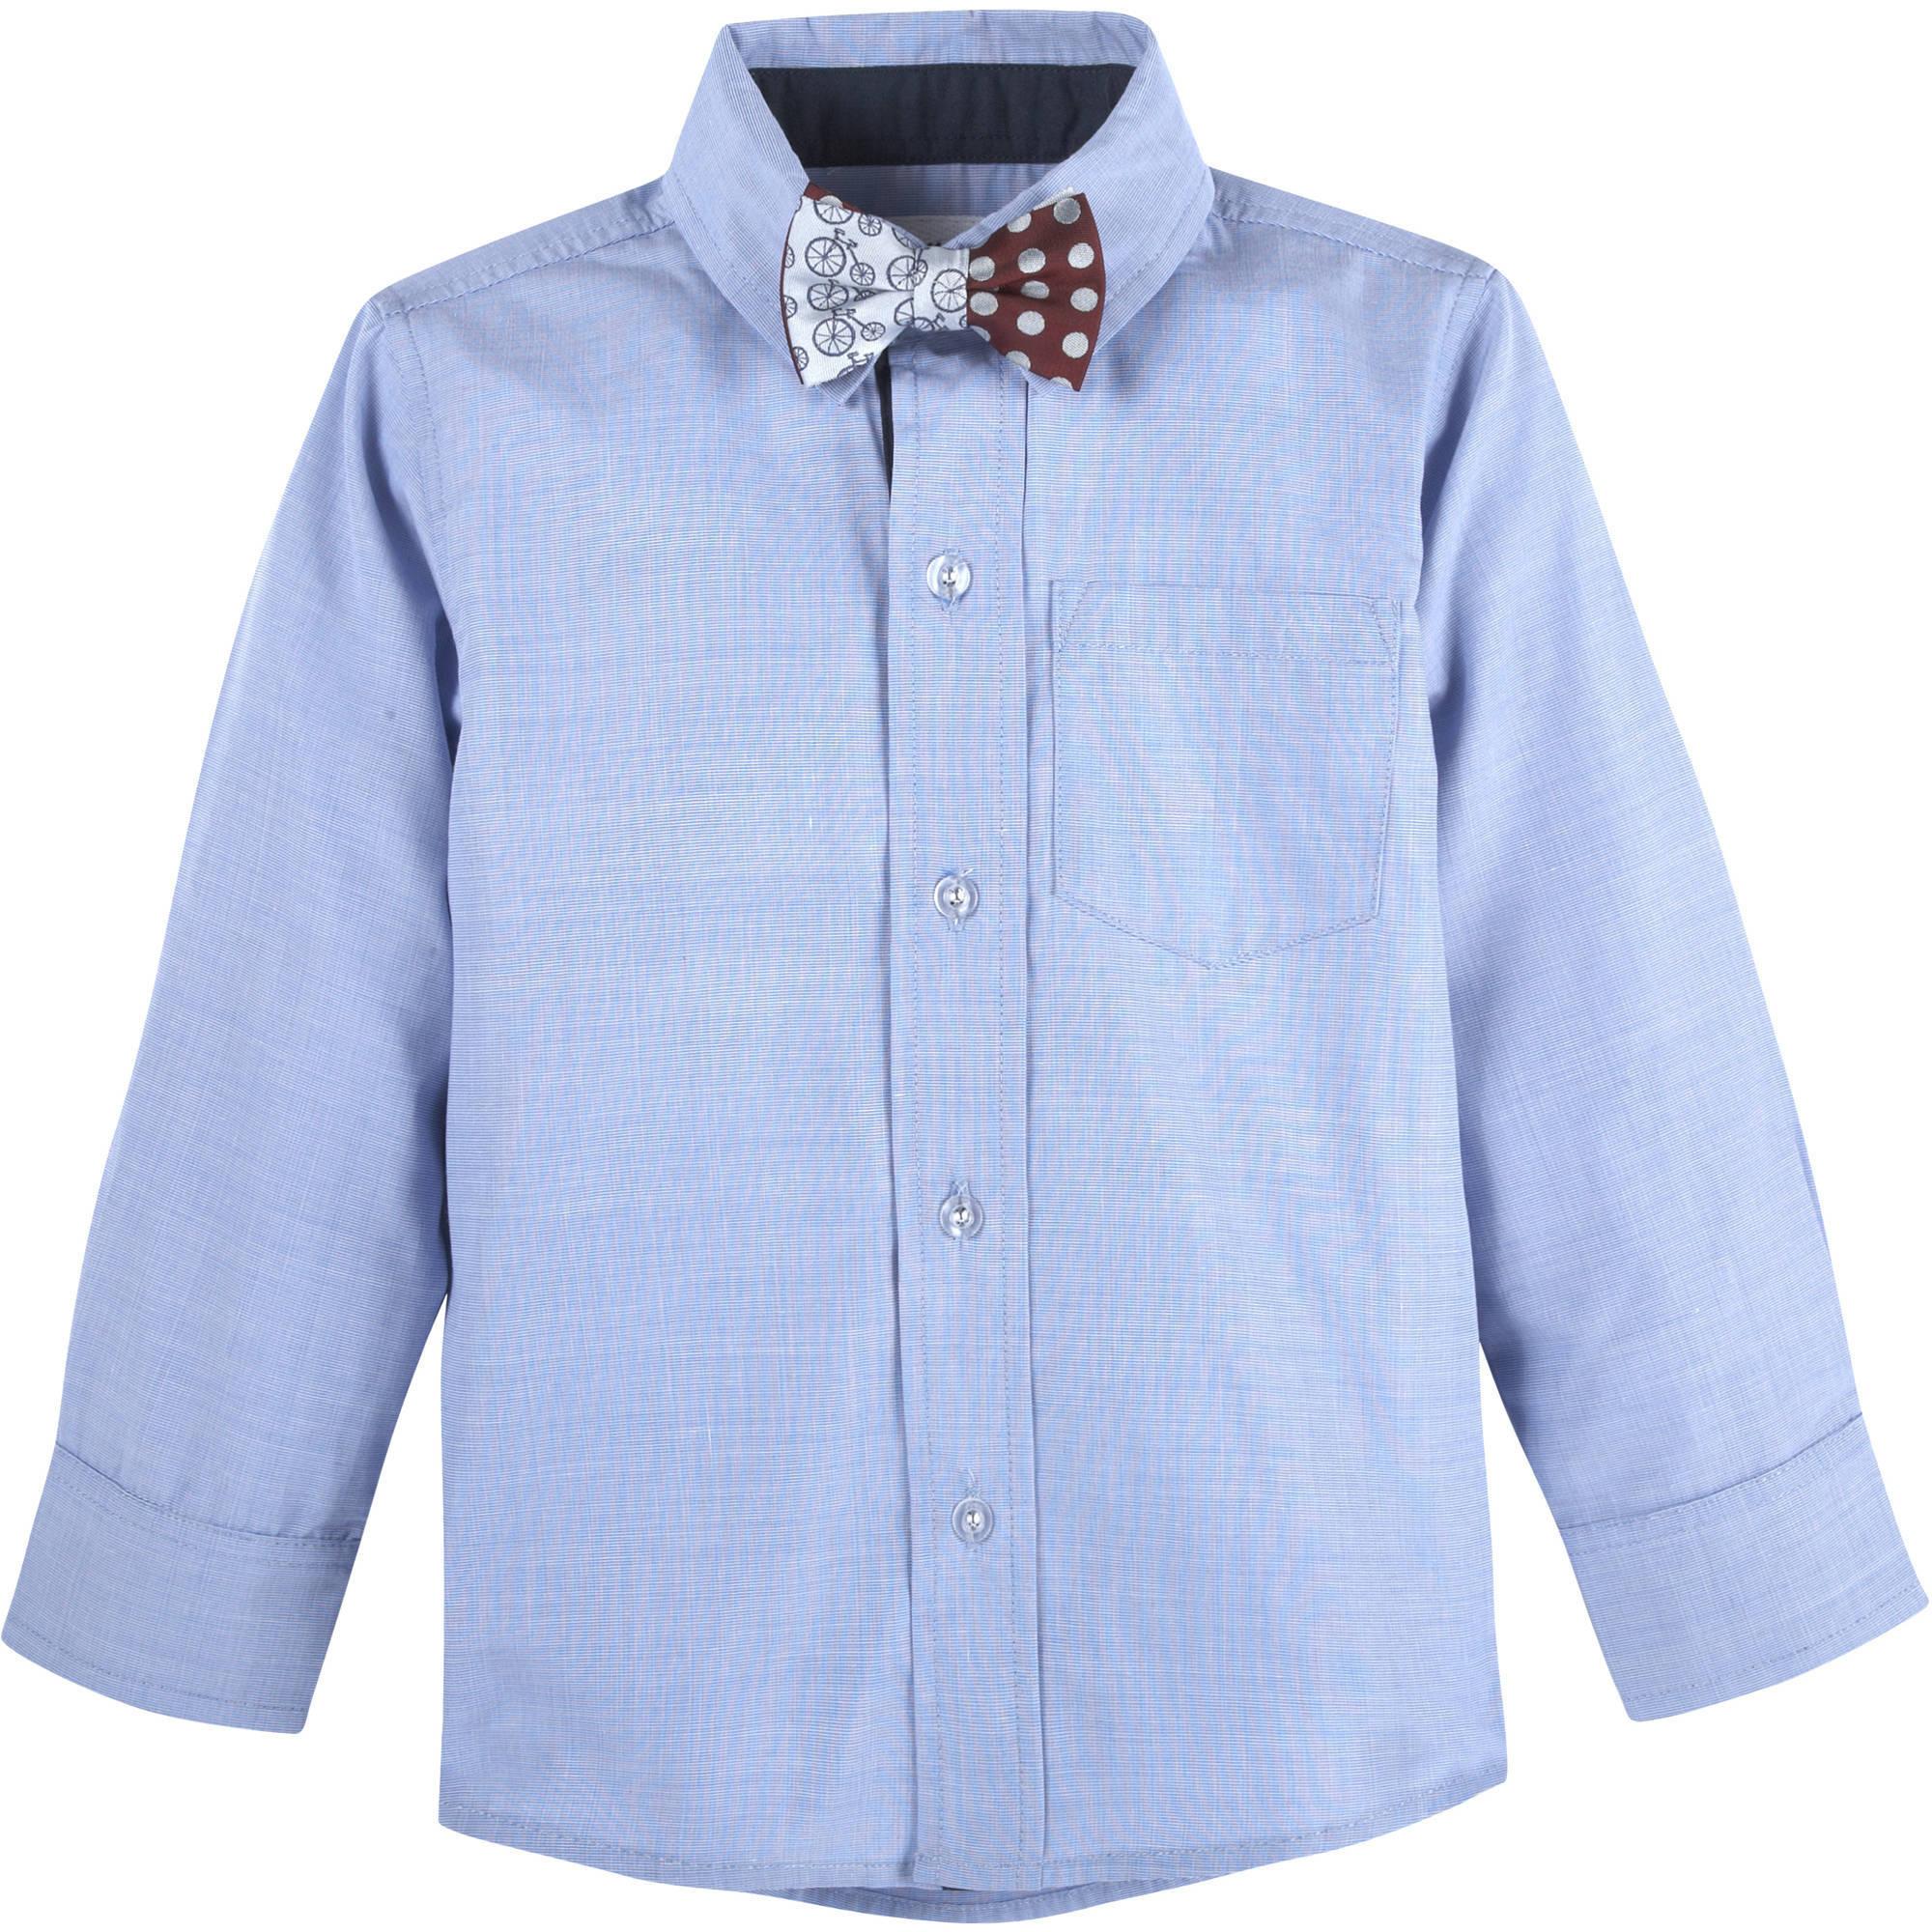 G-Cutee Baby Toddler Boy Woven Shirt w/ Polka Dot Bowtie Set